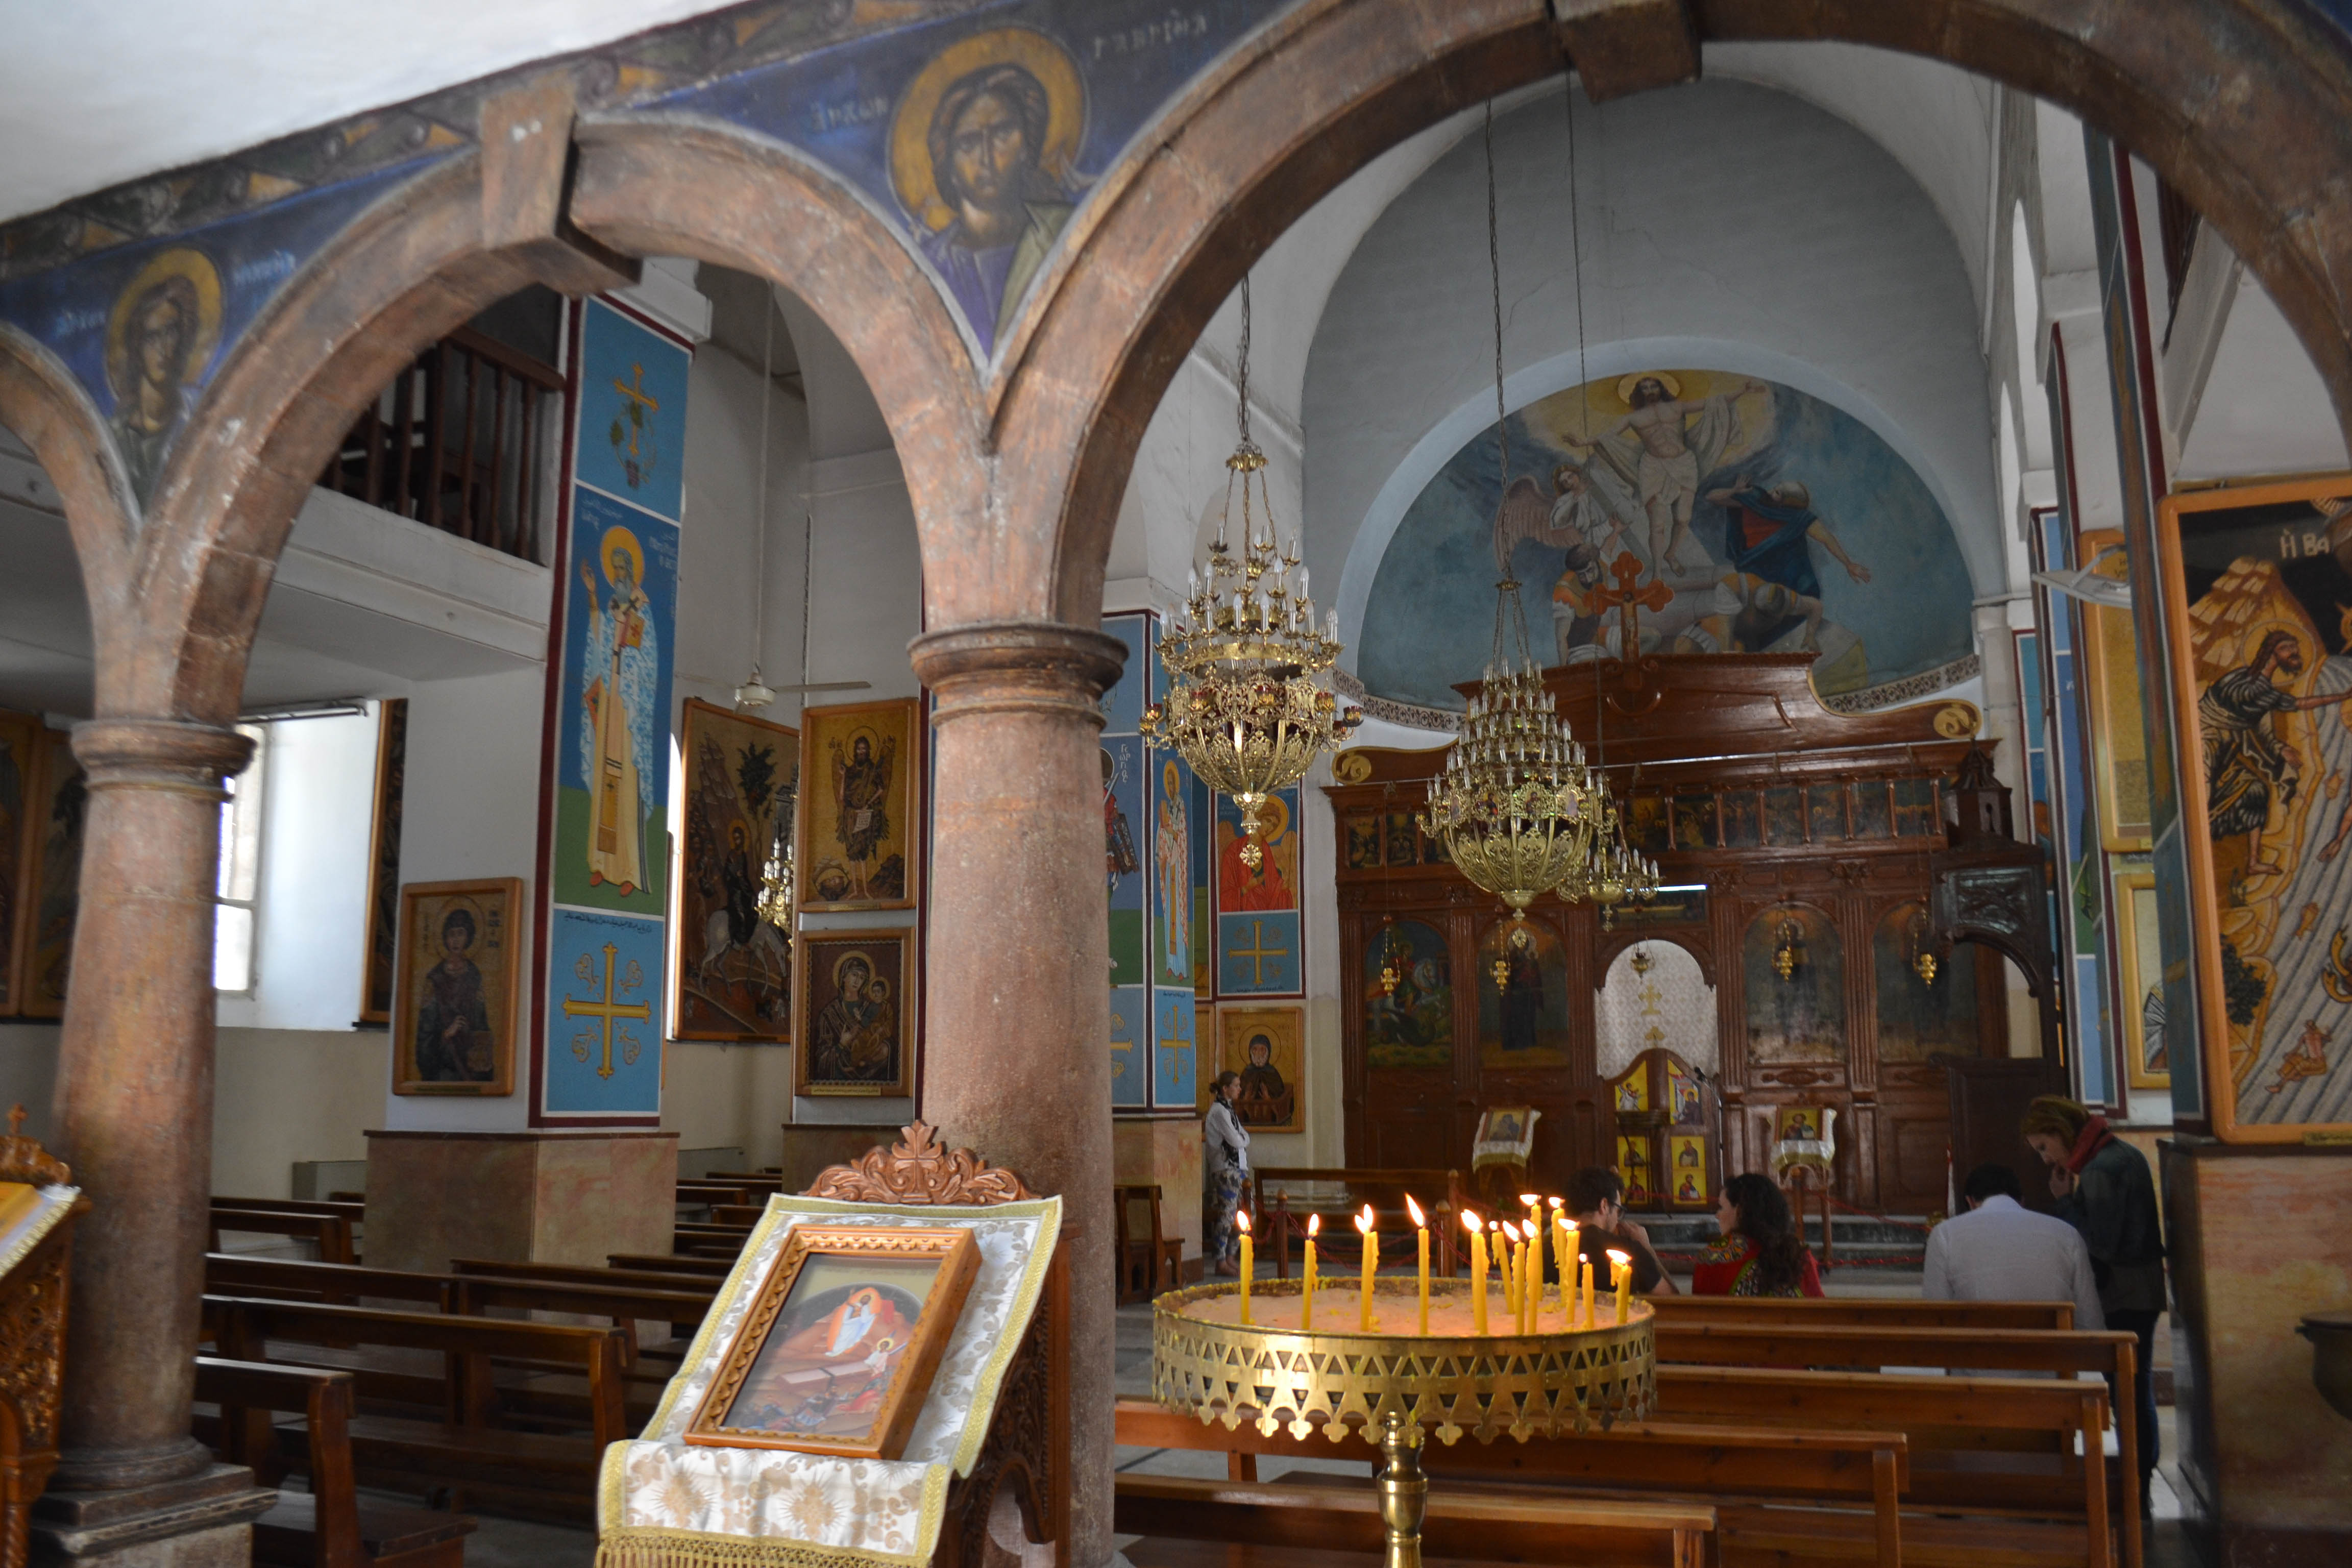 11:00 - 11:30 Madaba - Saint George church